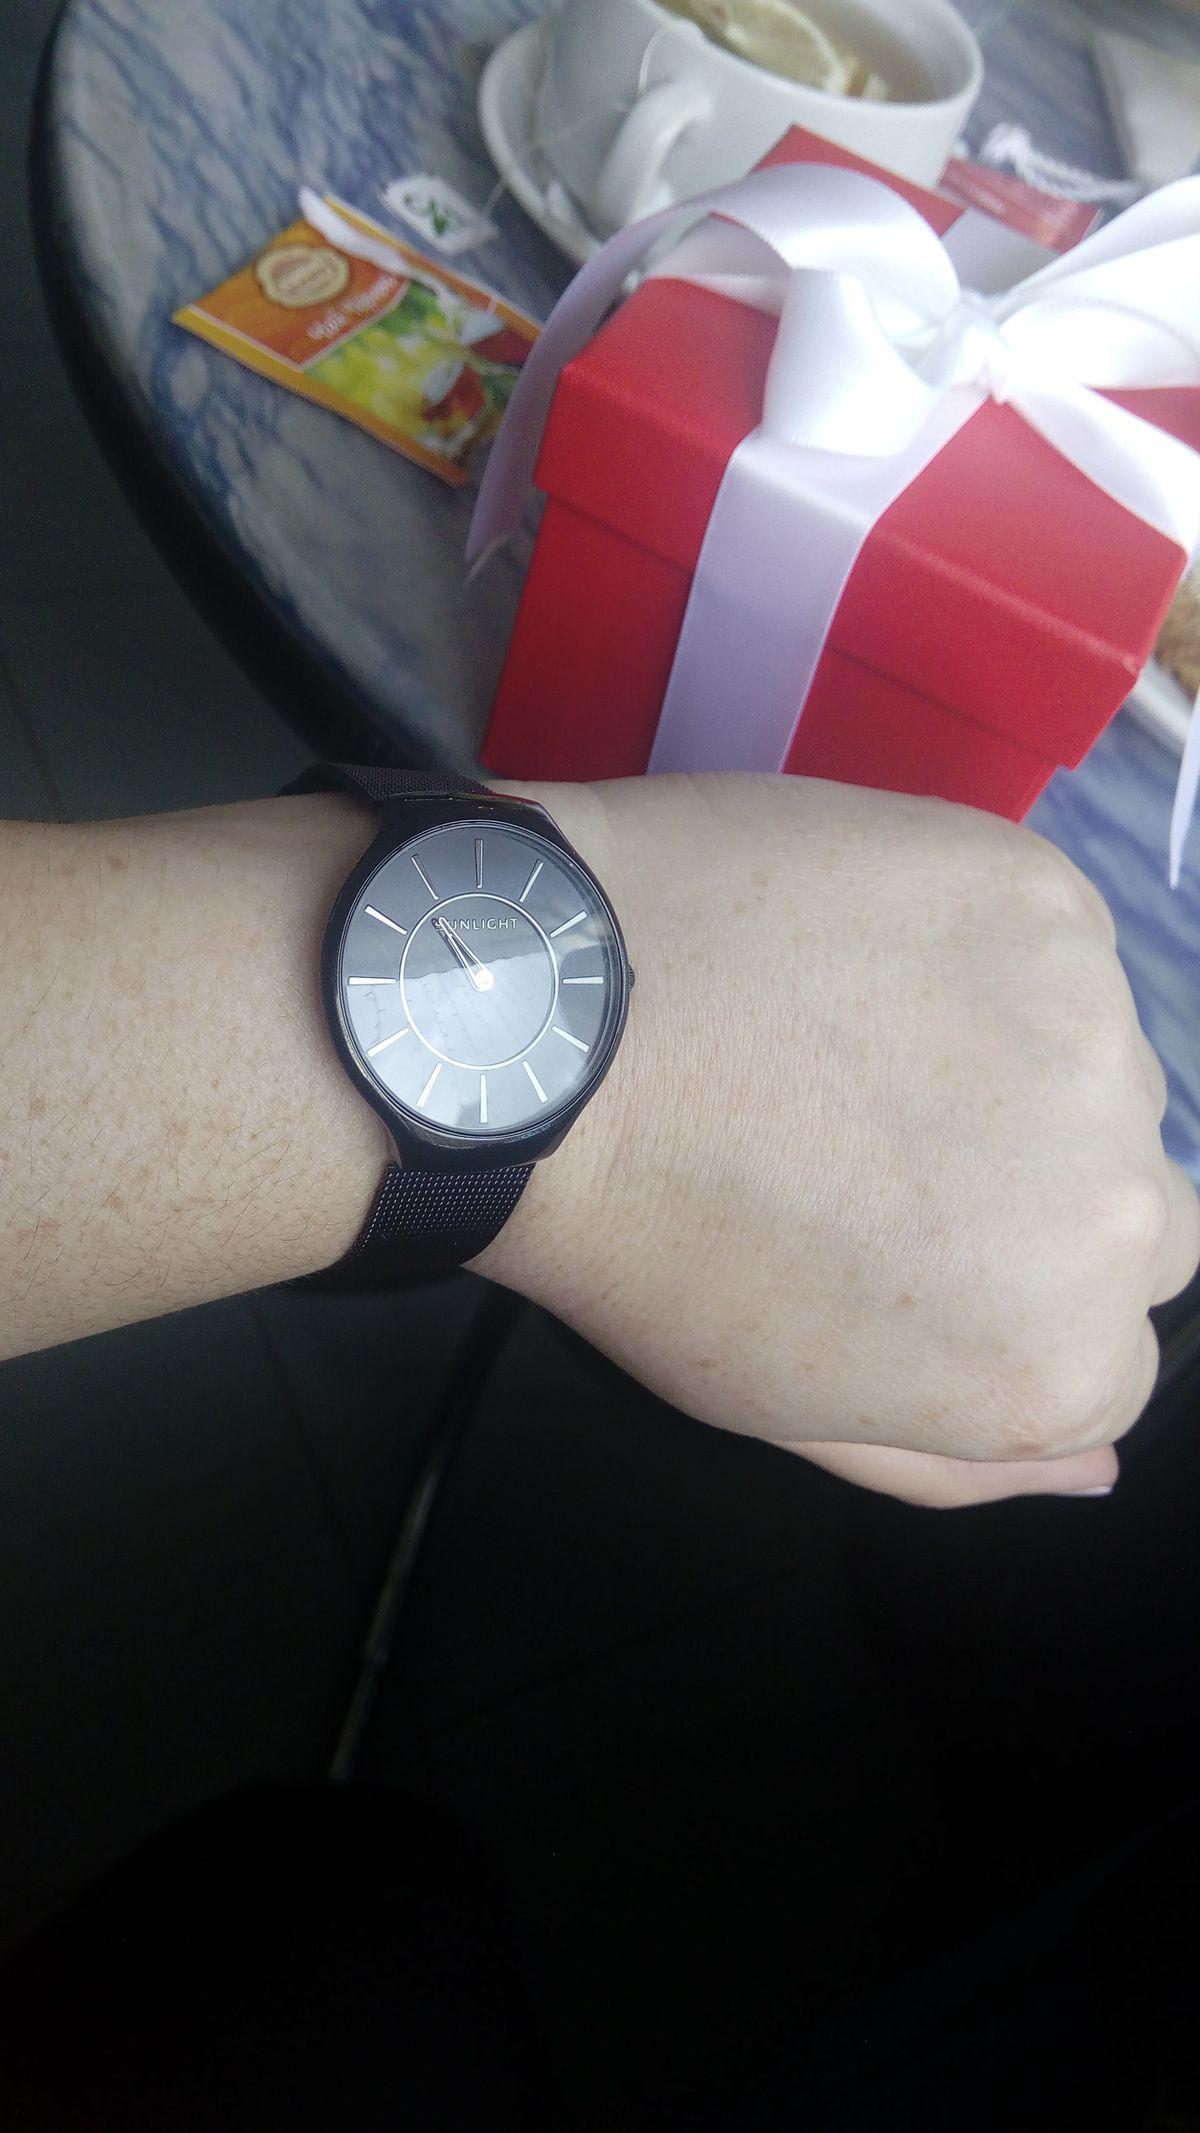 Заказала часы онлайн, но не честно, боялась, как вживую